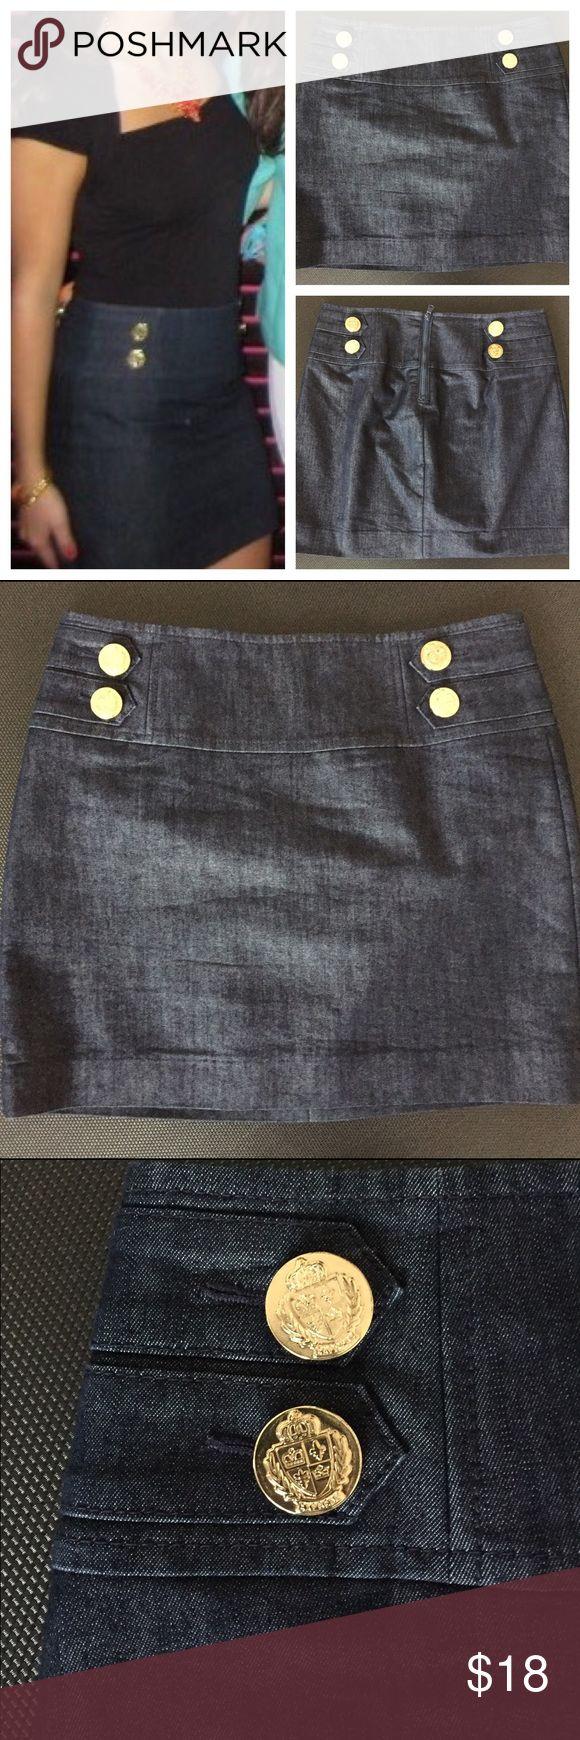 Express dark denim nautical skirt Only worn once! Express Women's Size 0 Denim Miniskirt with Gold Buttons. Zipper on the back.  Great condition. Express Skirts Mini